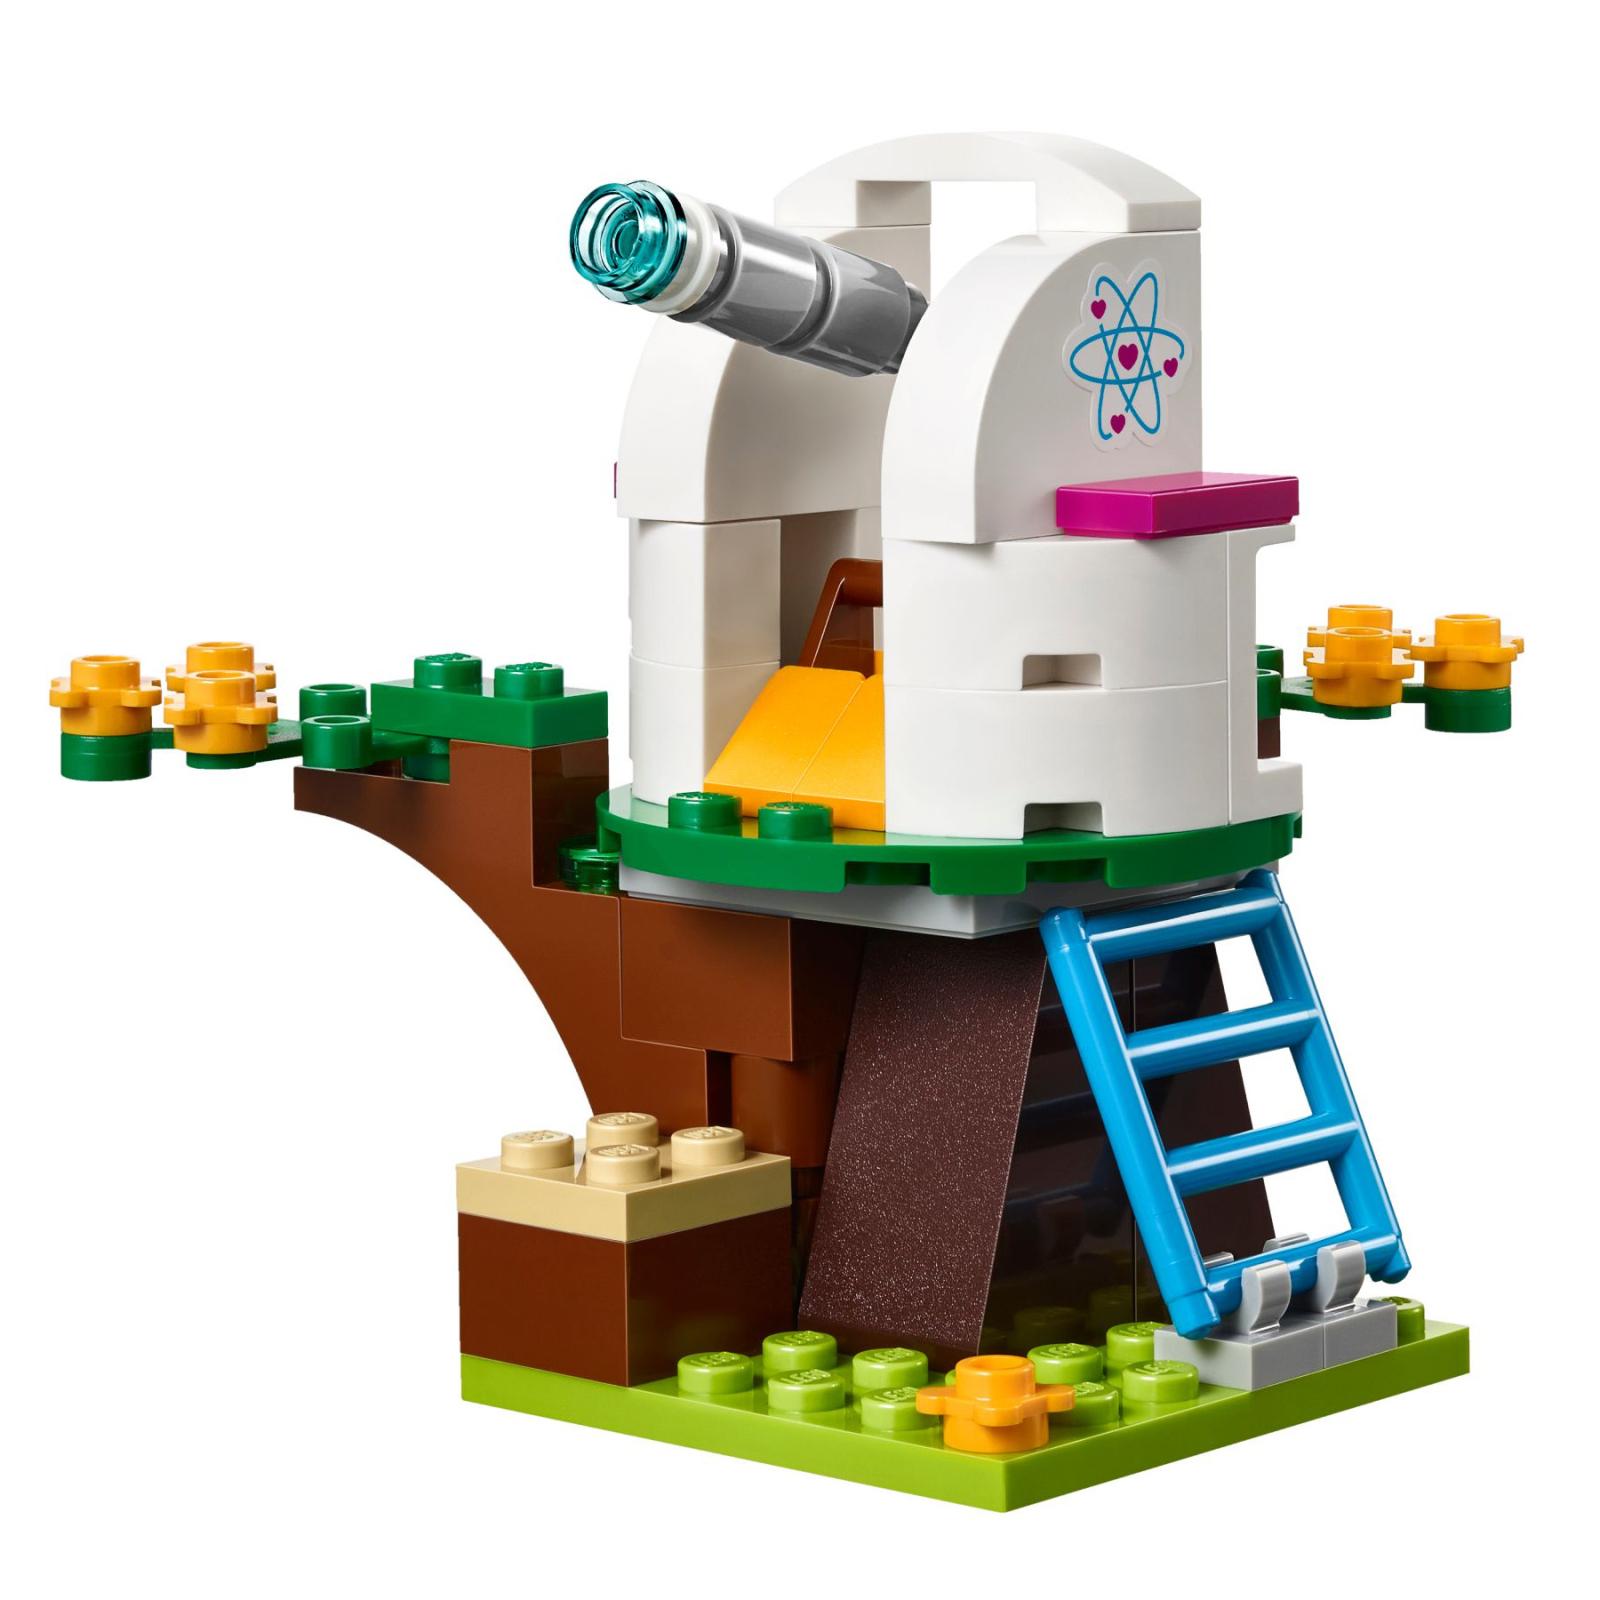 Конструктор LEGO Friends Звездное небо Оливии (41116) изображение 5